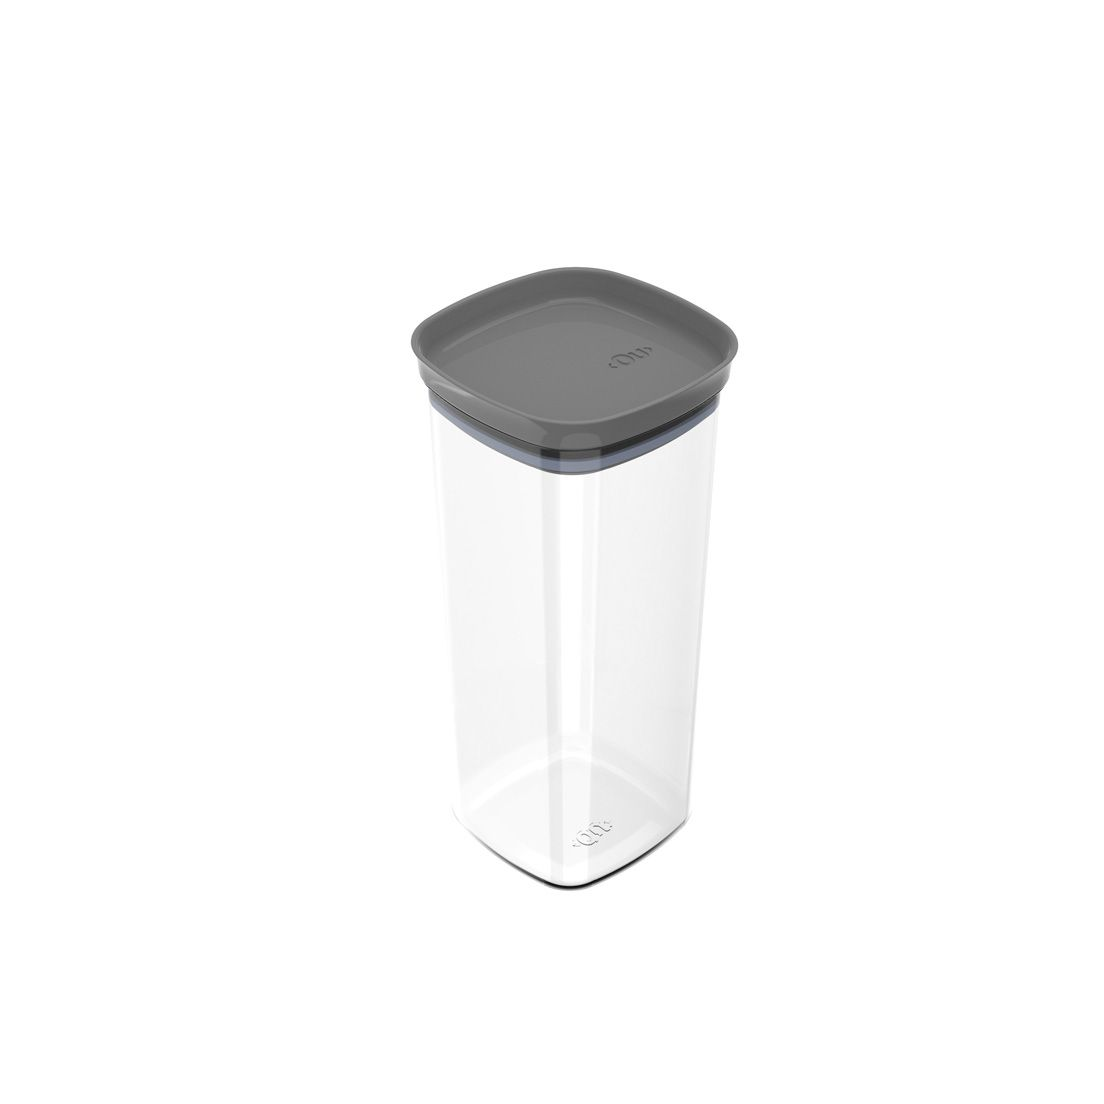 Pote 1,5L de Plástico com Tampa Hermética Block Chumbo